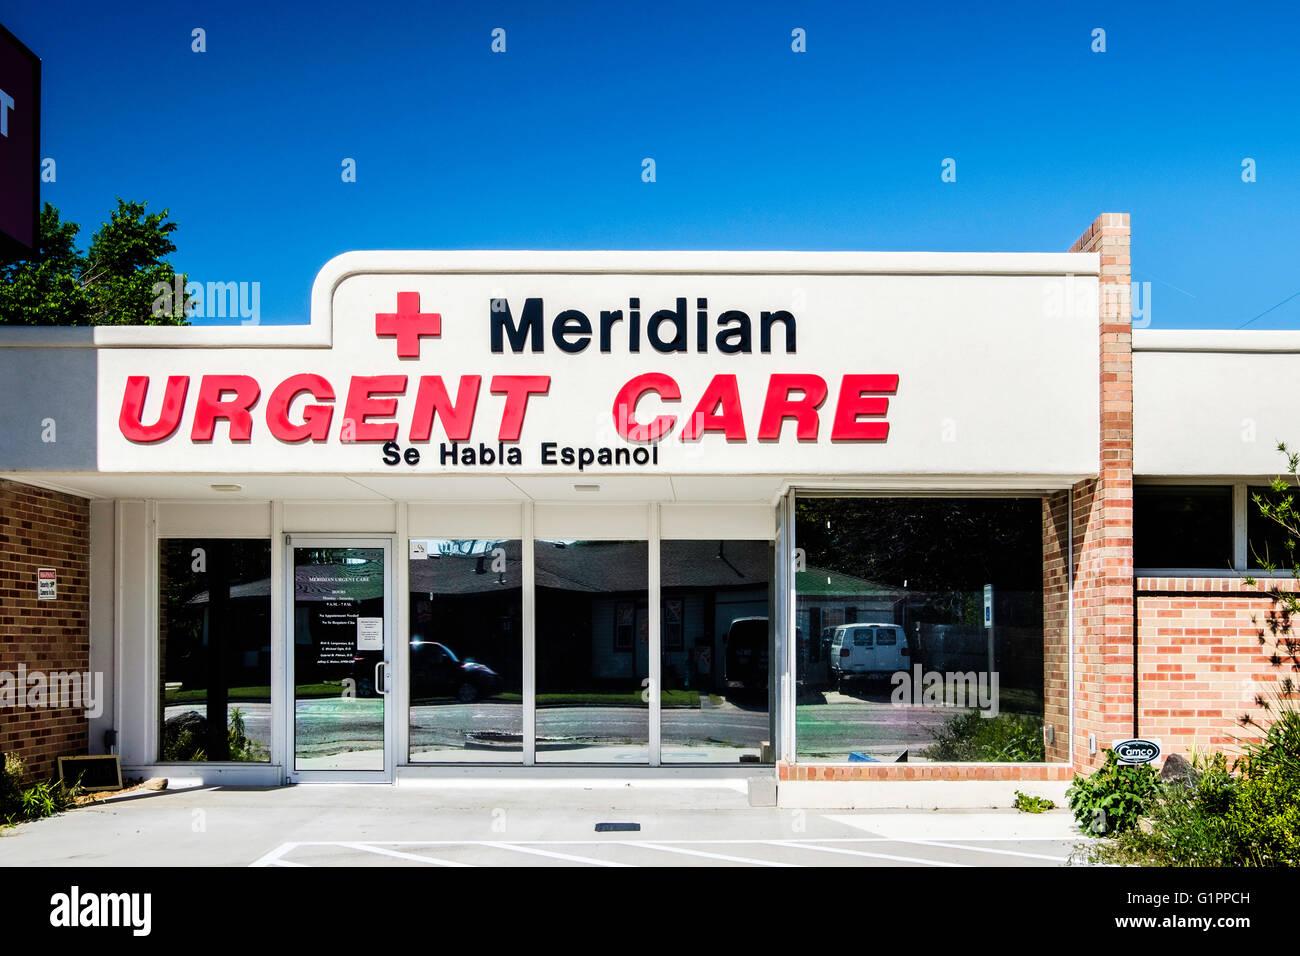 Urgent Care Stock Photos Urgent Care Stock Images Alamy